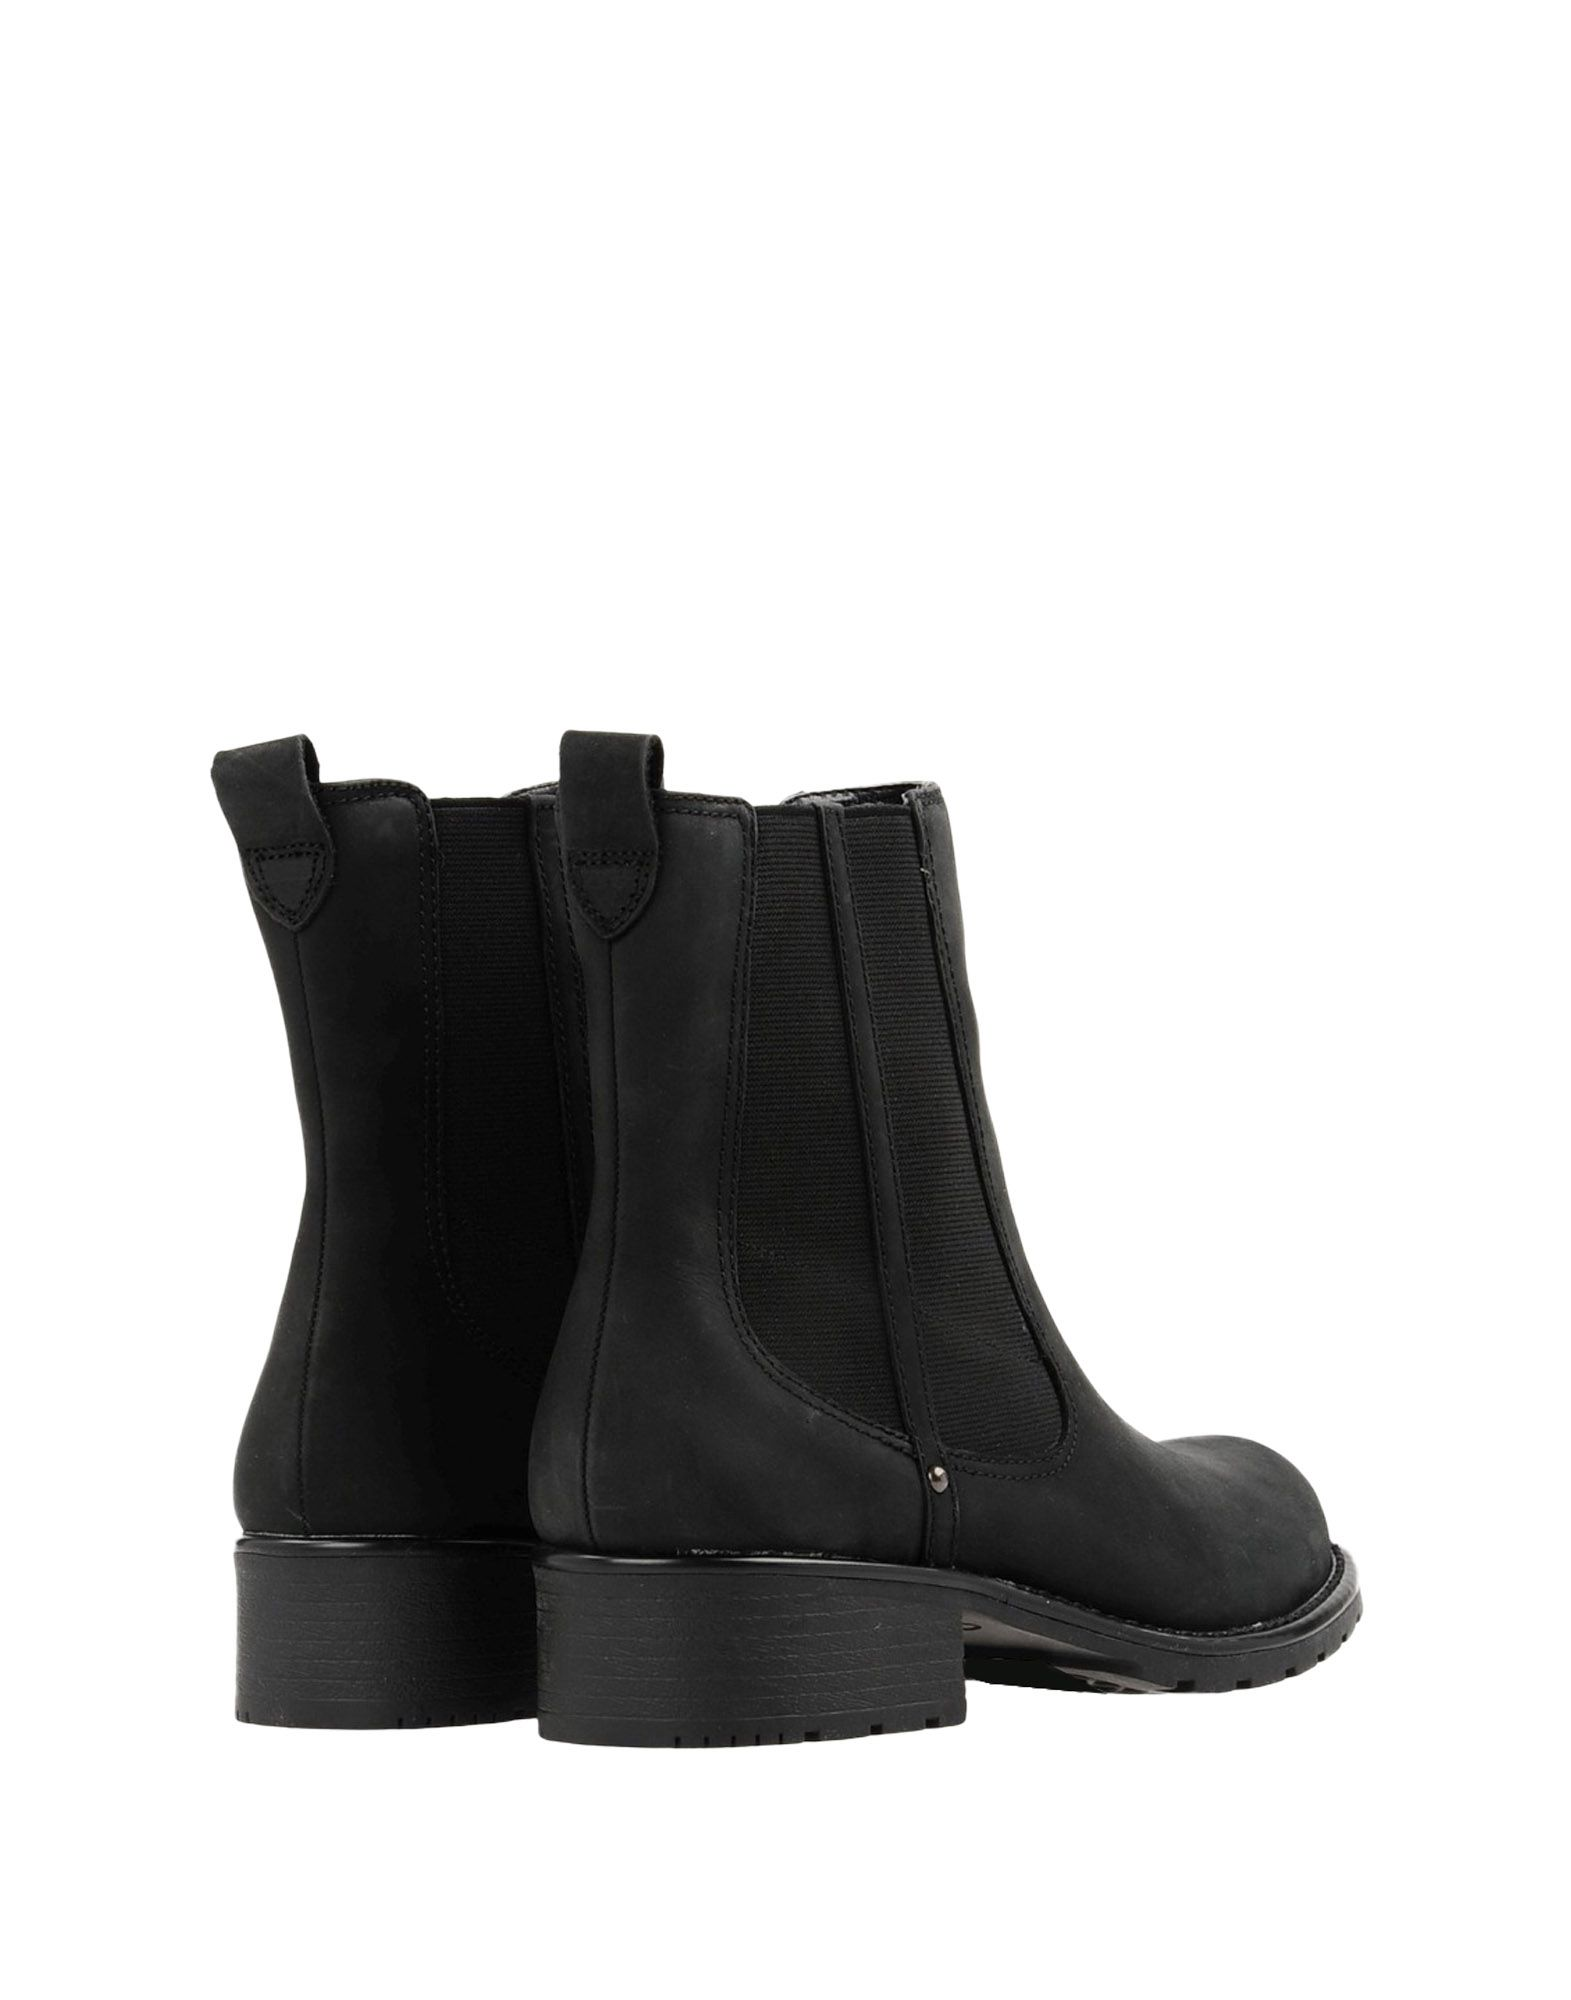 Chelsea Boots Clarks Orinoco Club - Donna - 11338494FP